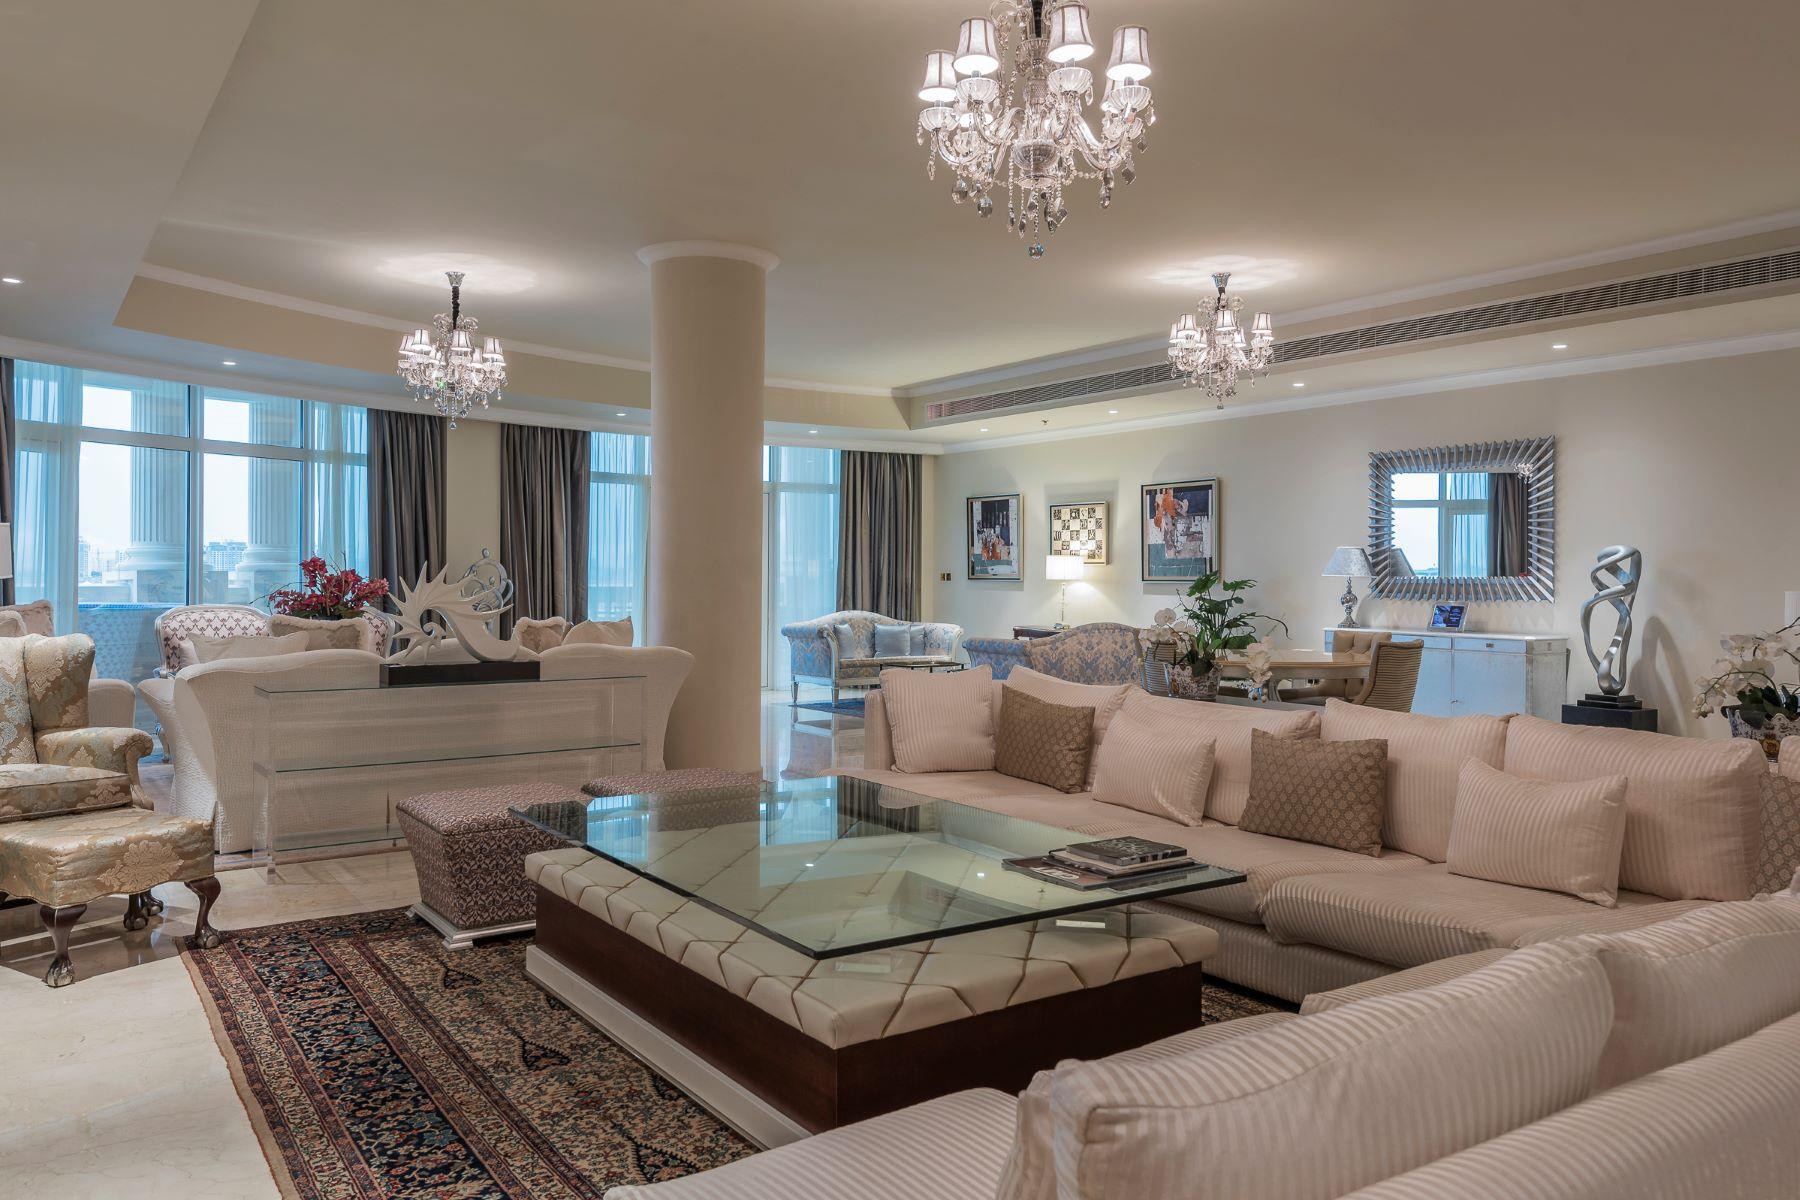 Apartment for Sale at Kempinski Residence Dubai, Dubai United Arab Emirates